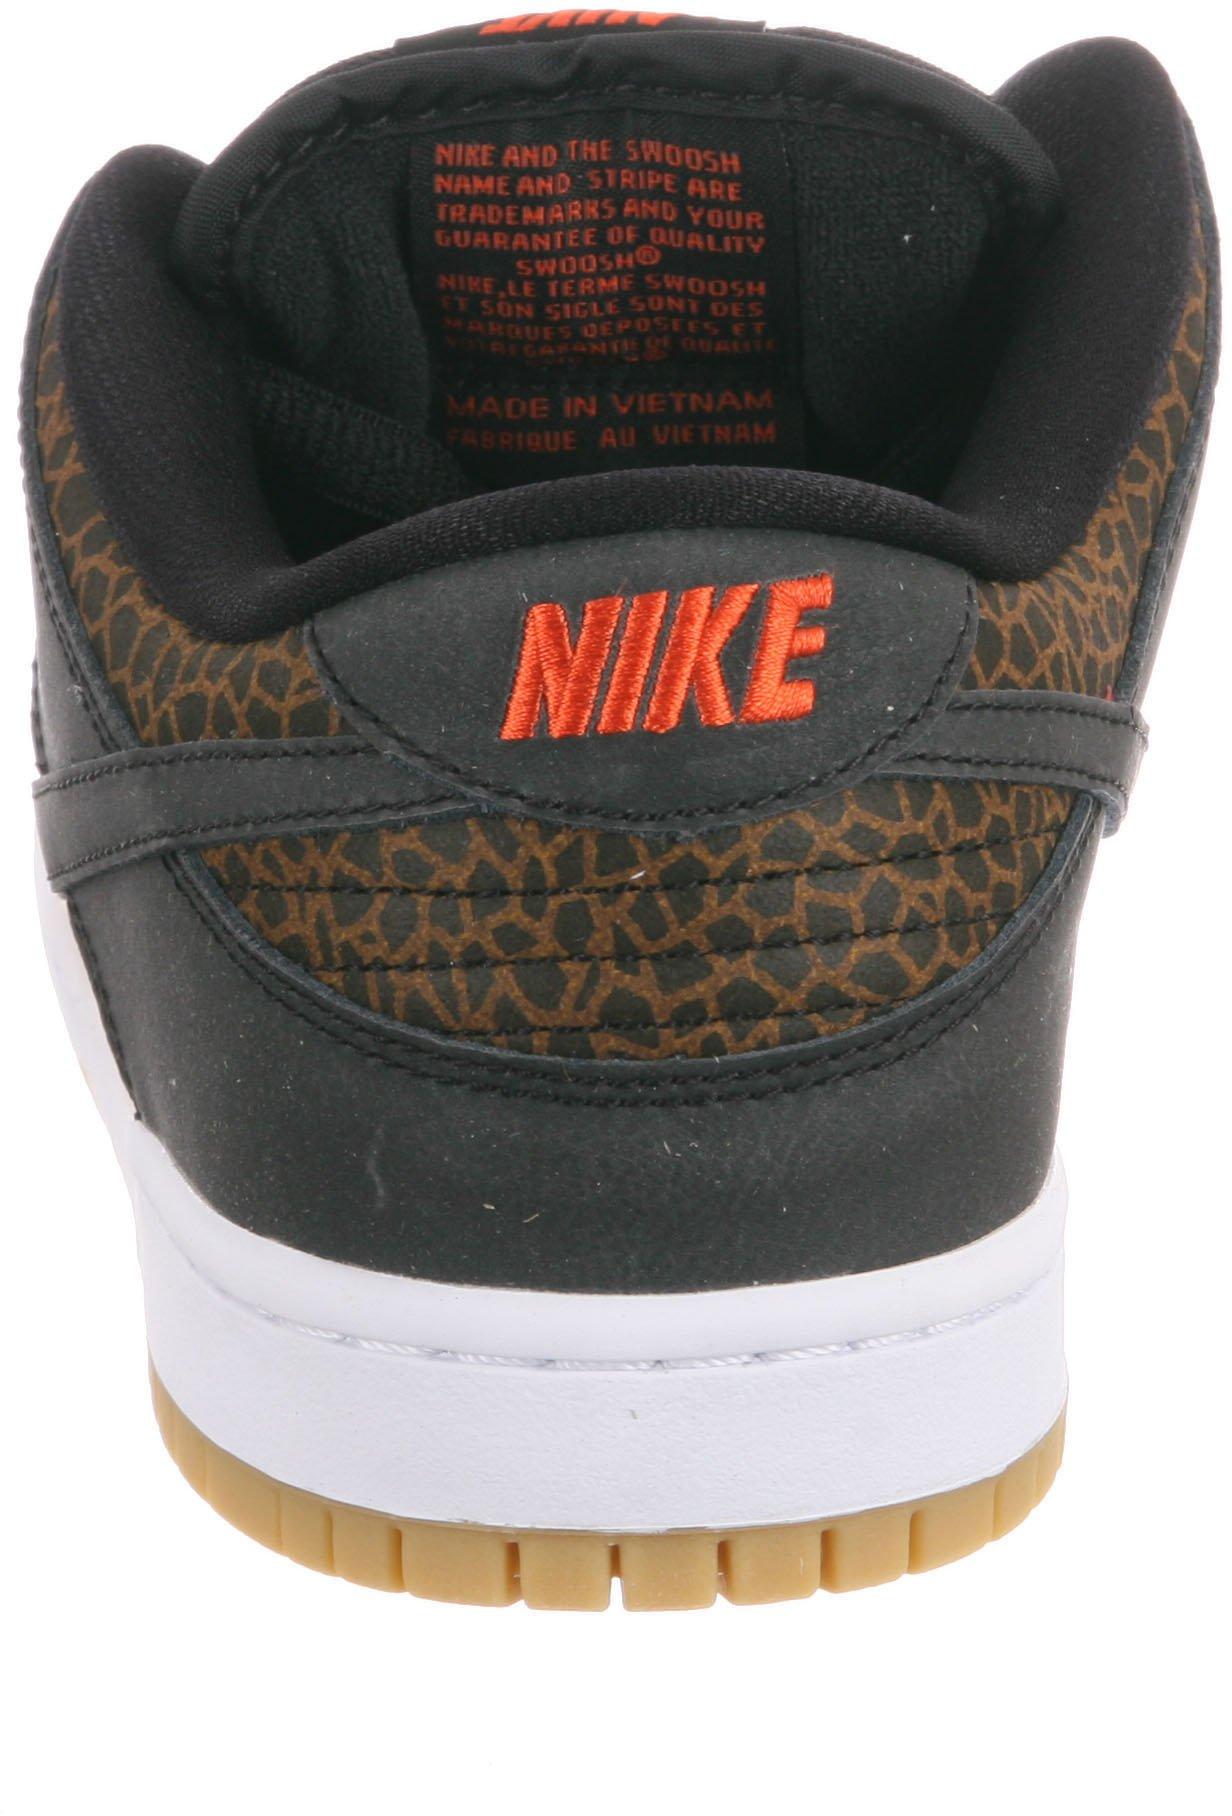 Nike Dunk Low Premium SB 313170-018 High Performance Skateboarding Shoes ?